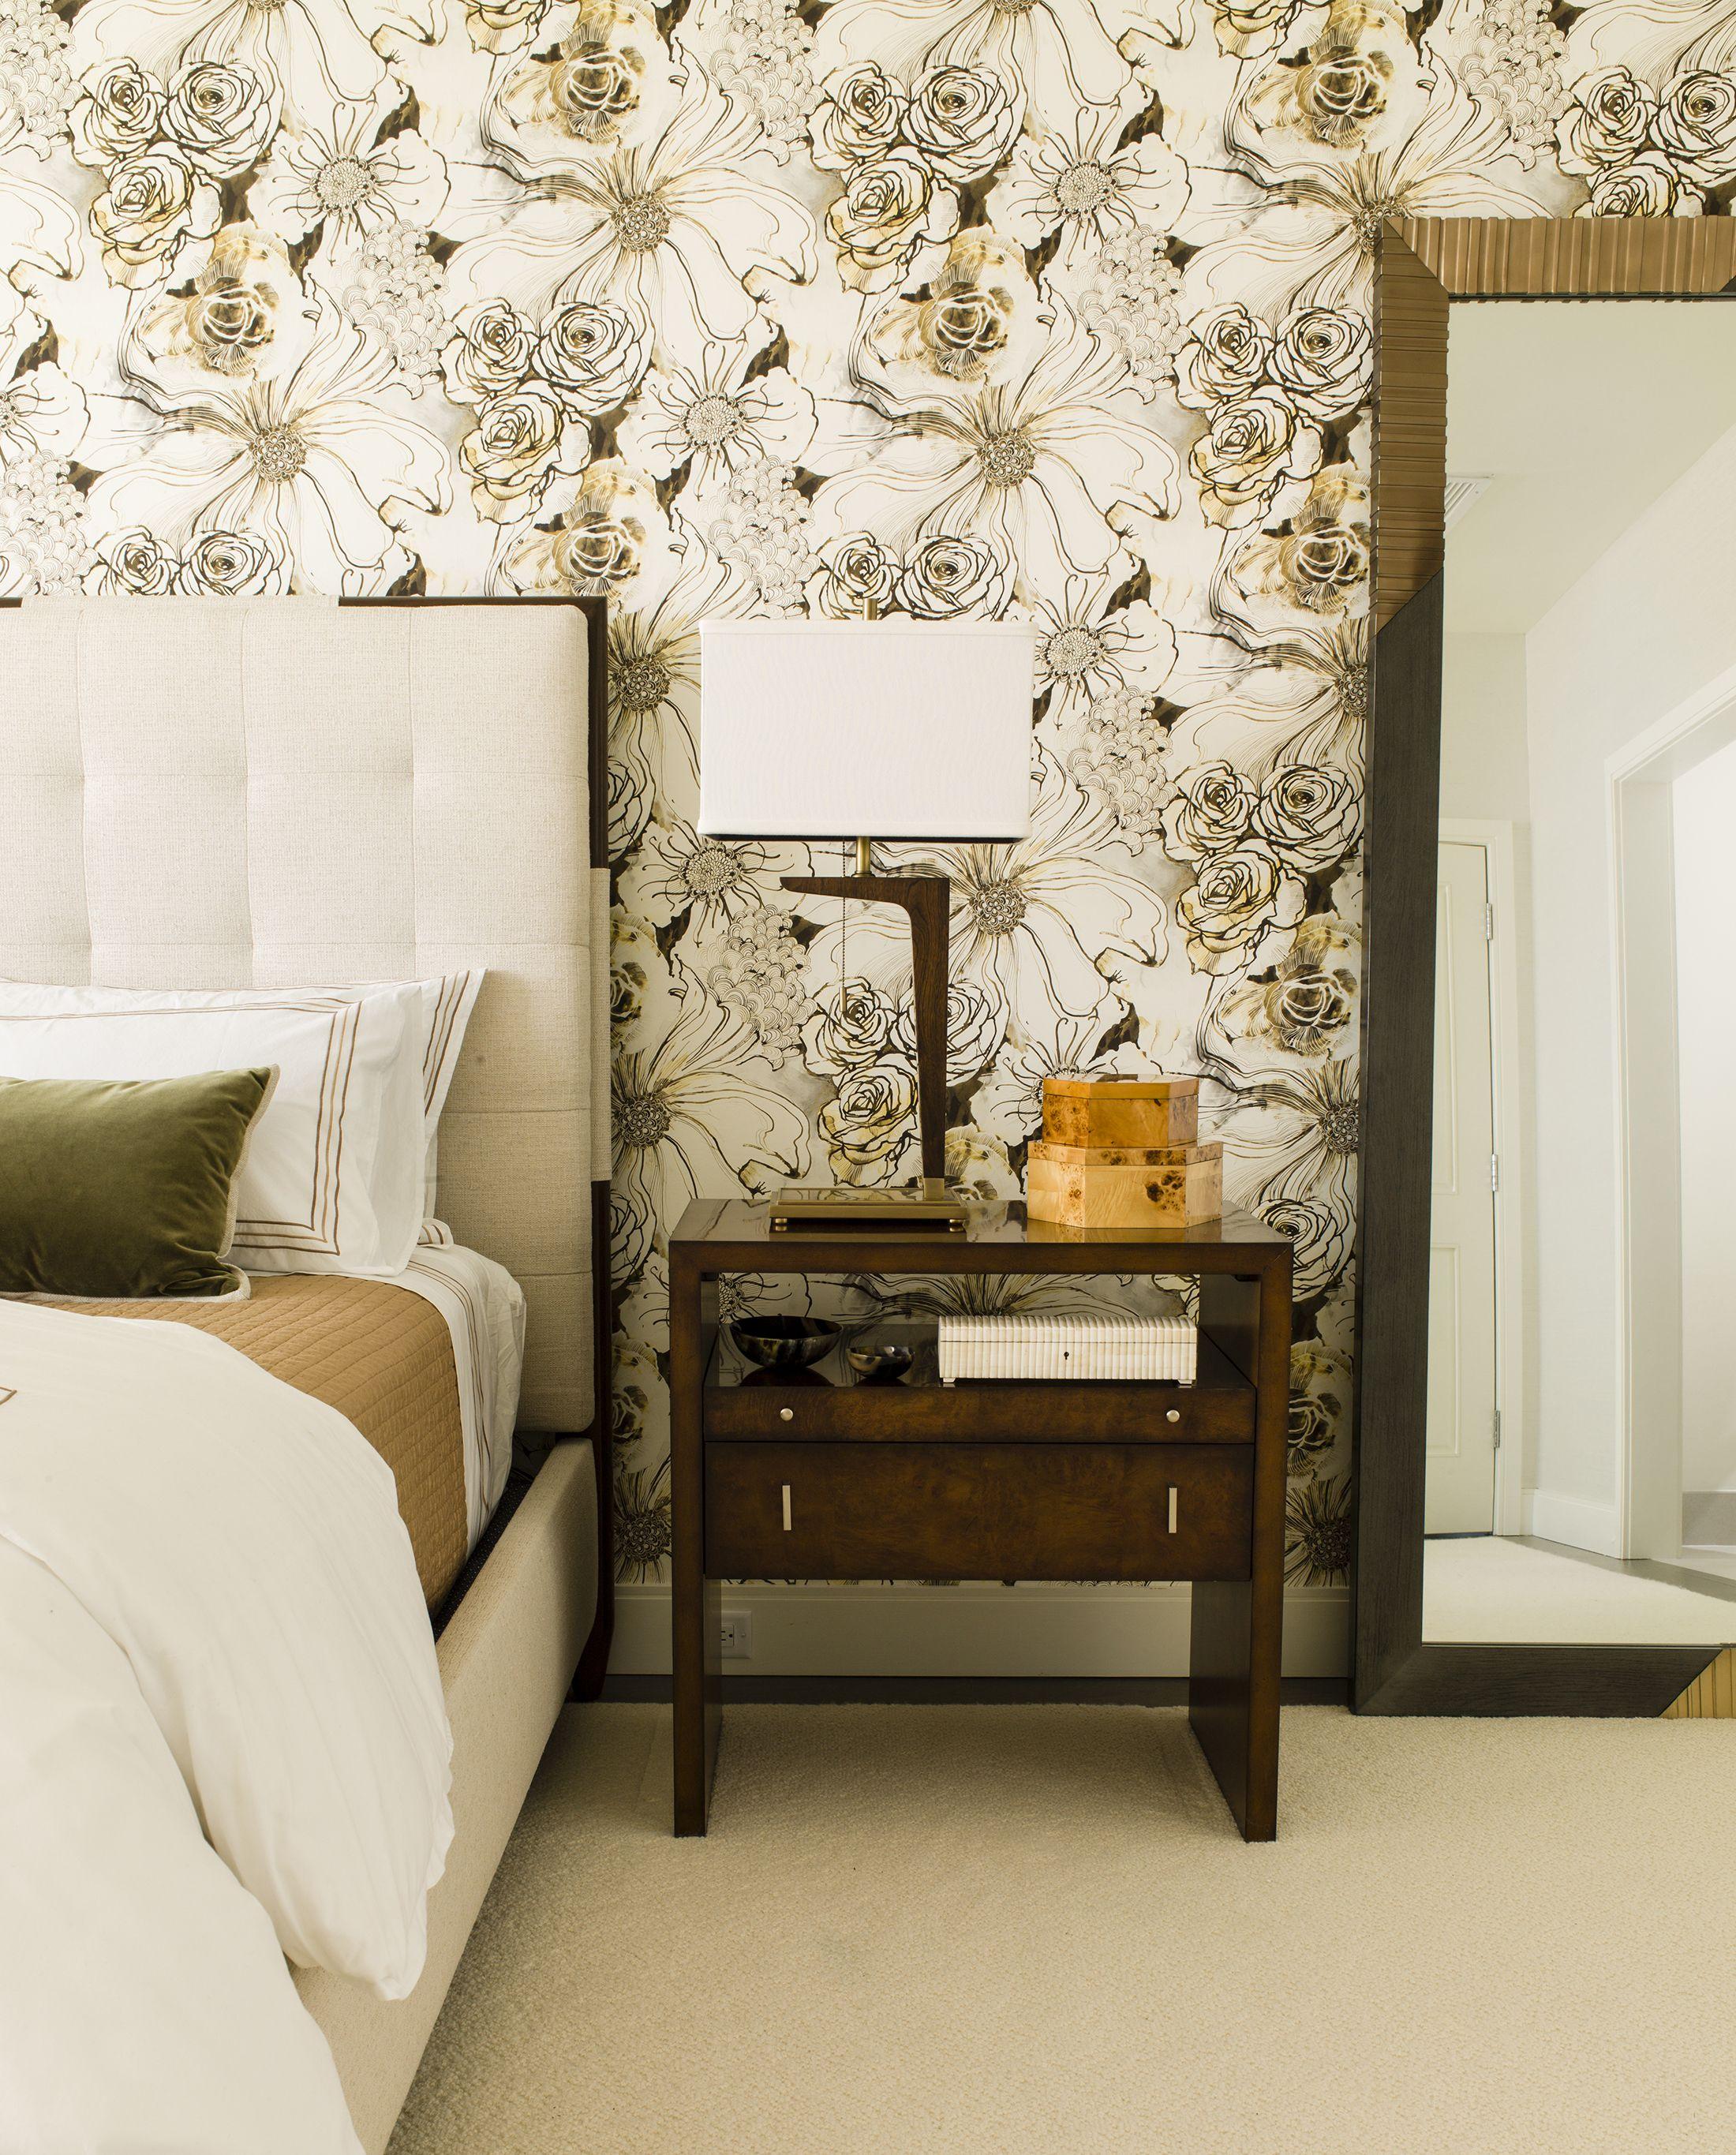 30 bedrooms with statement wallpaper rh elledecor com